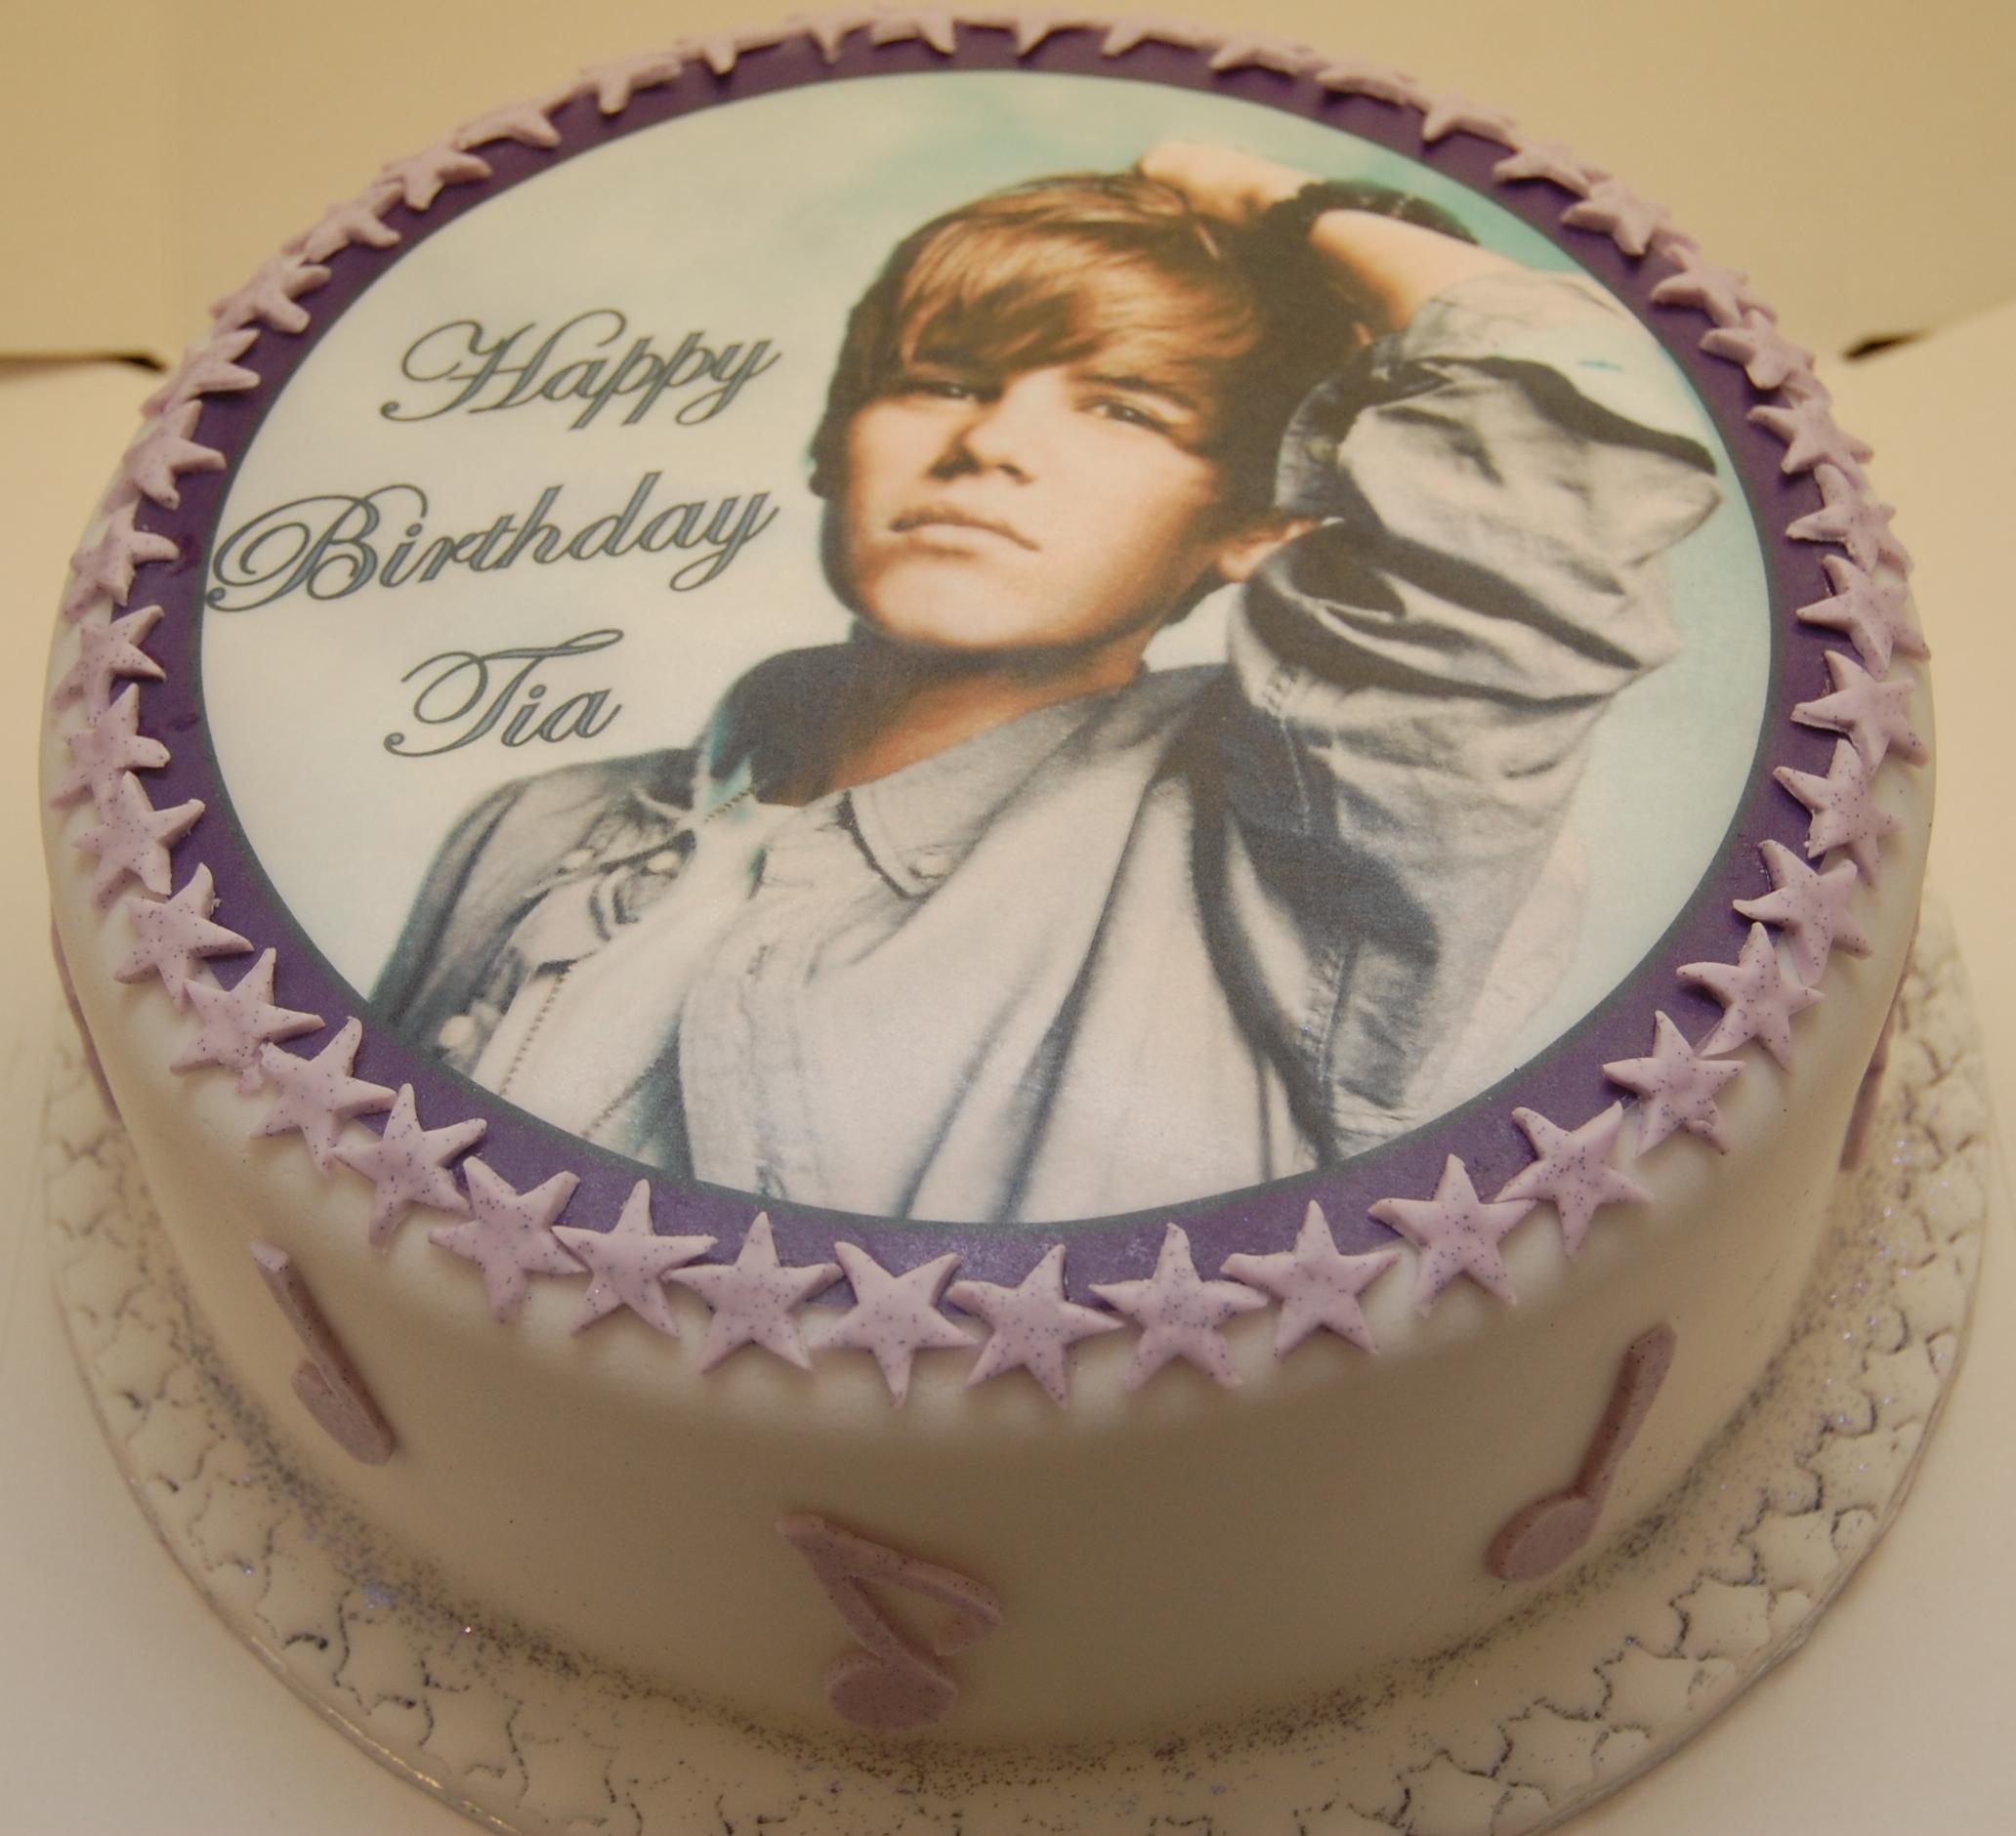 Enjoyable A Special Birthday Cake For A Justin Bieber Fan Hours Of Fun Funny Birthday Cards Online Elaedamsfinfo